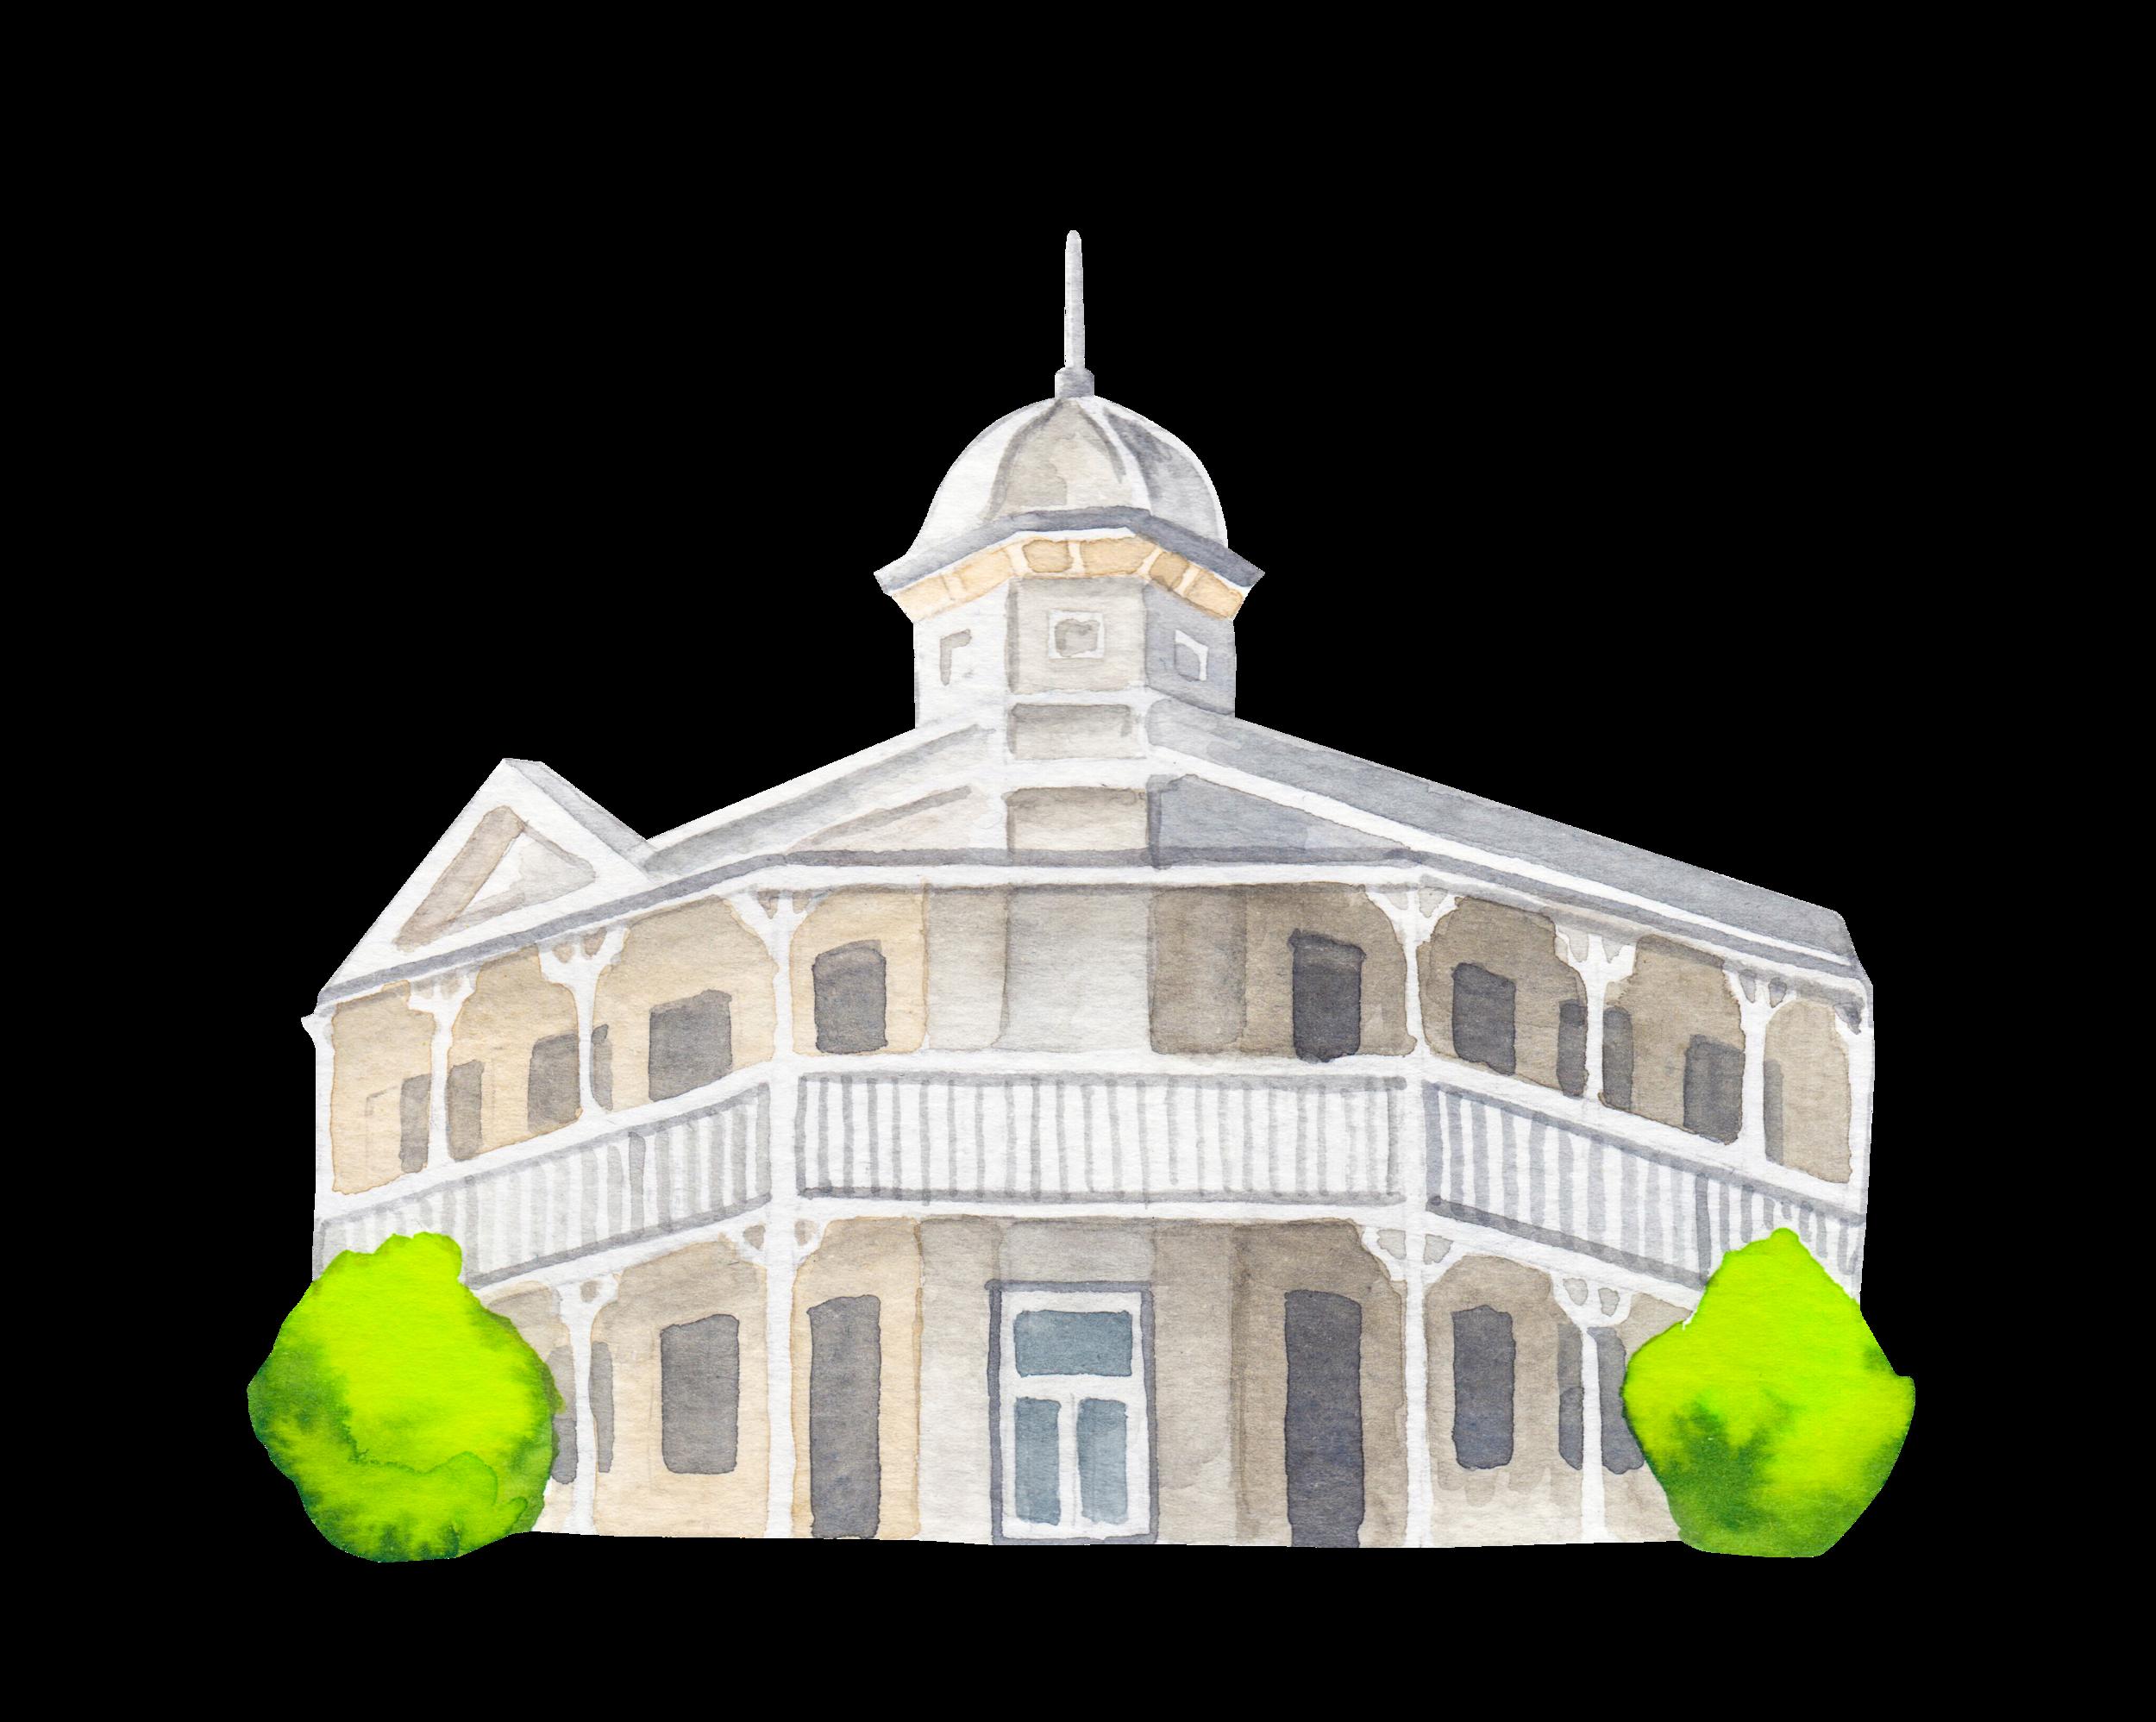 6. Plympton Hotel (Tradewinds)